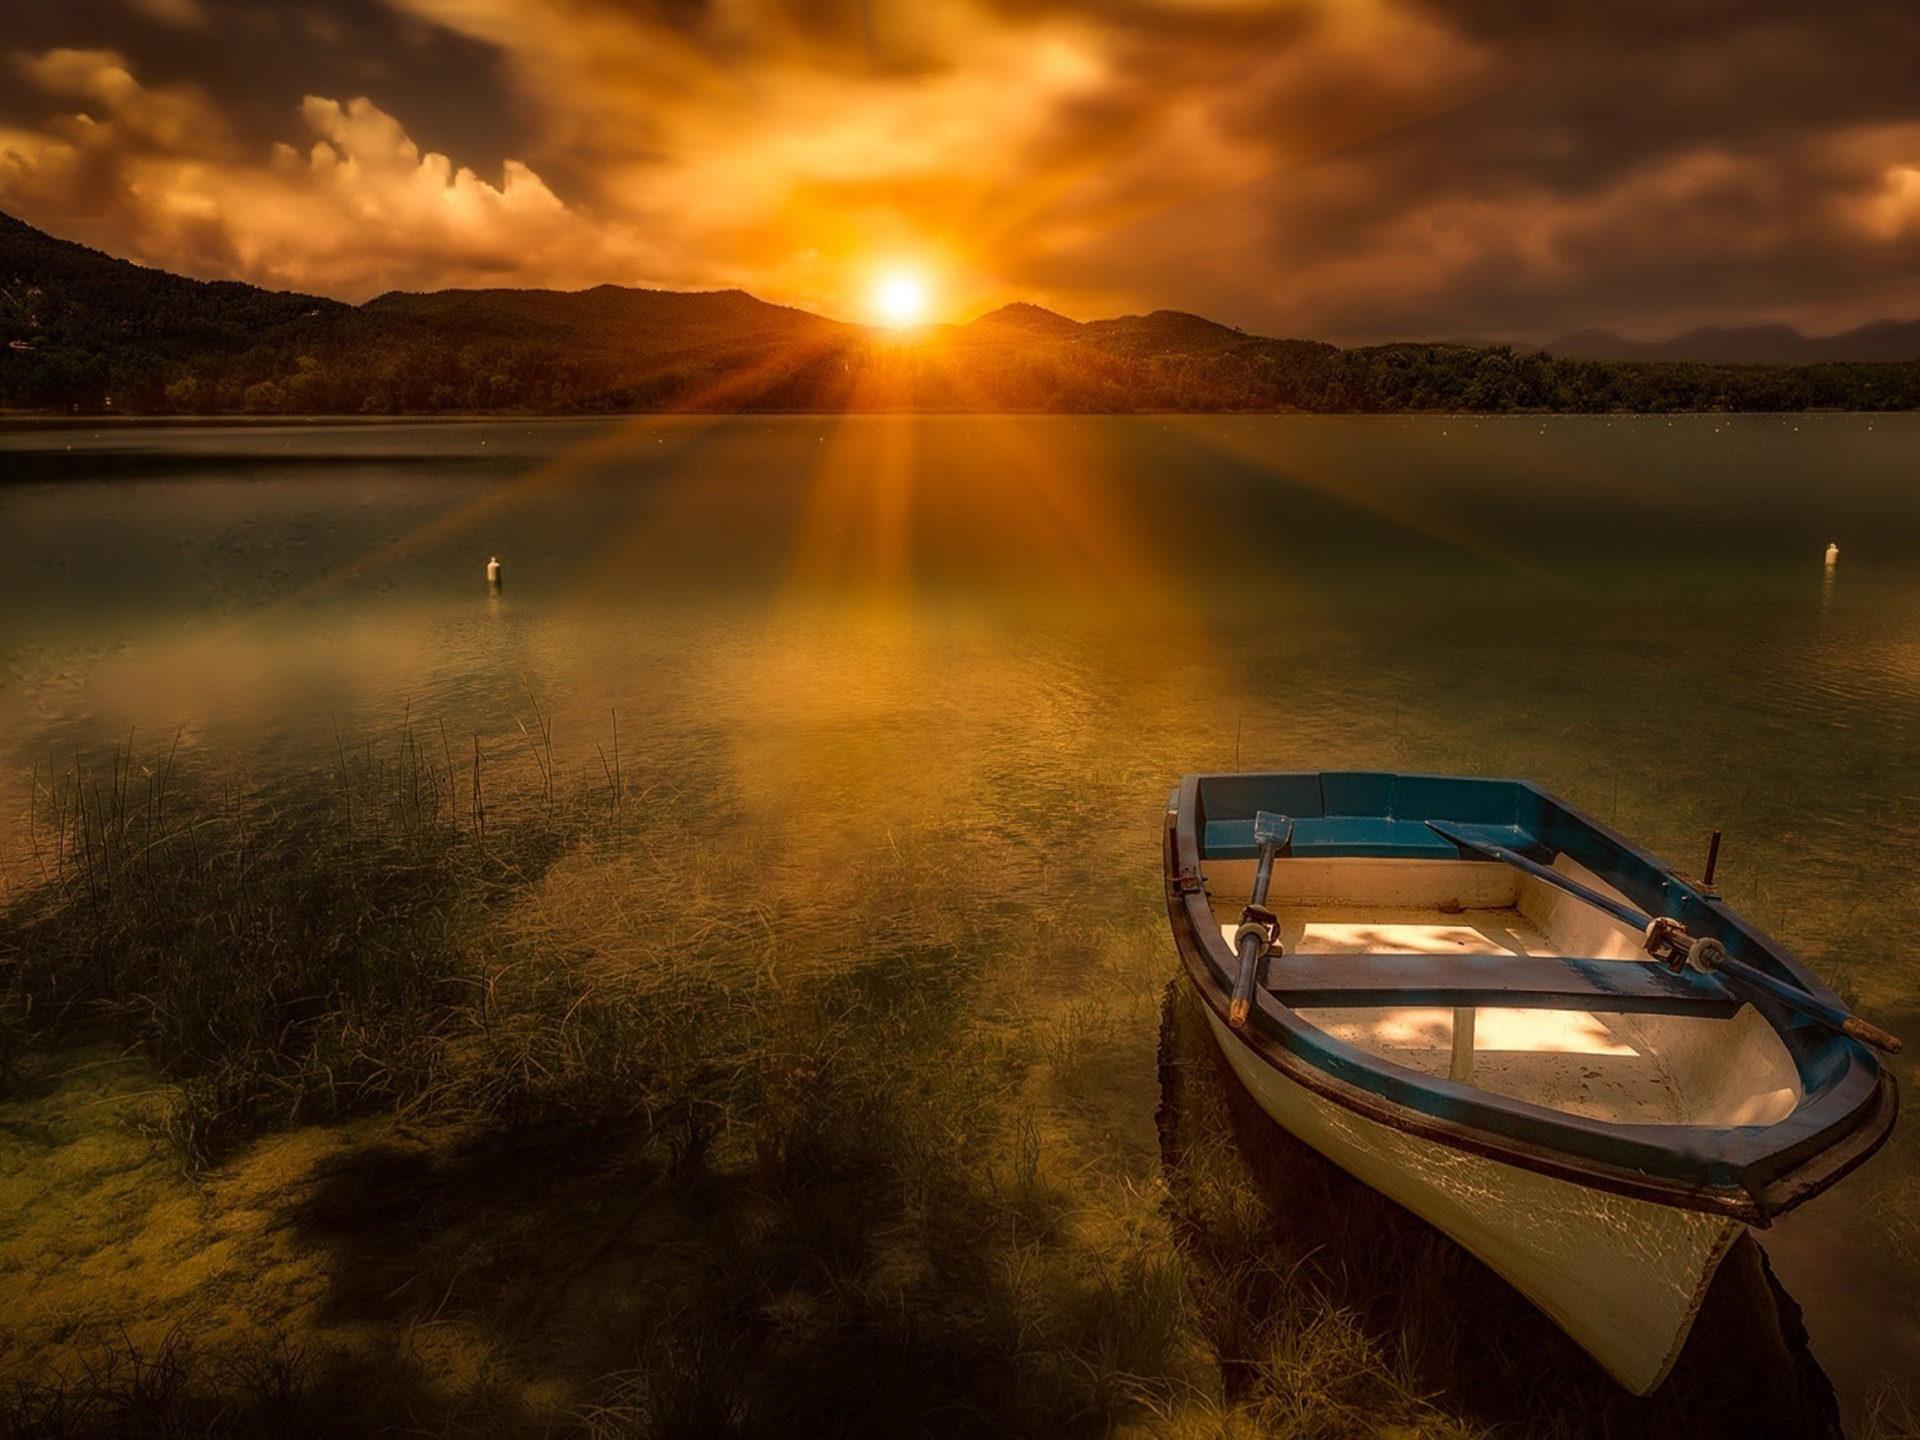 Ipad Wallpaper Hd Free Morning Sunrise Sun Lake Boat Evaporation Fog Hd Wallpaper